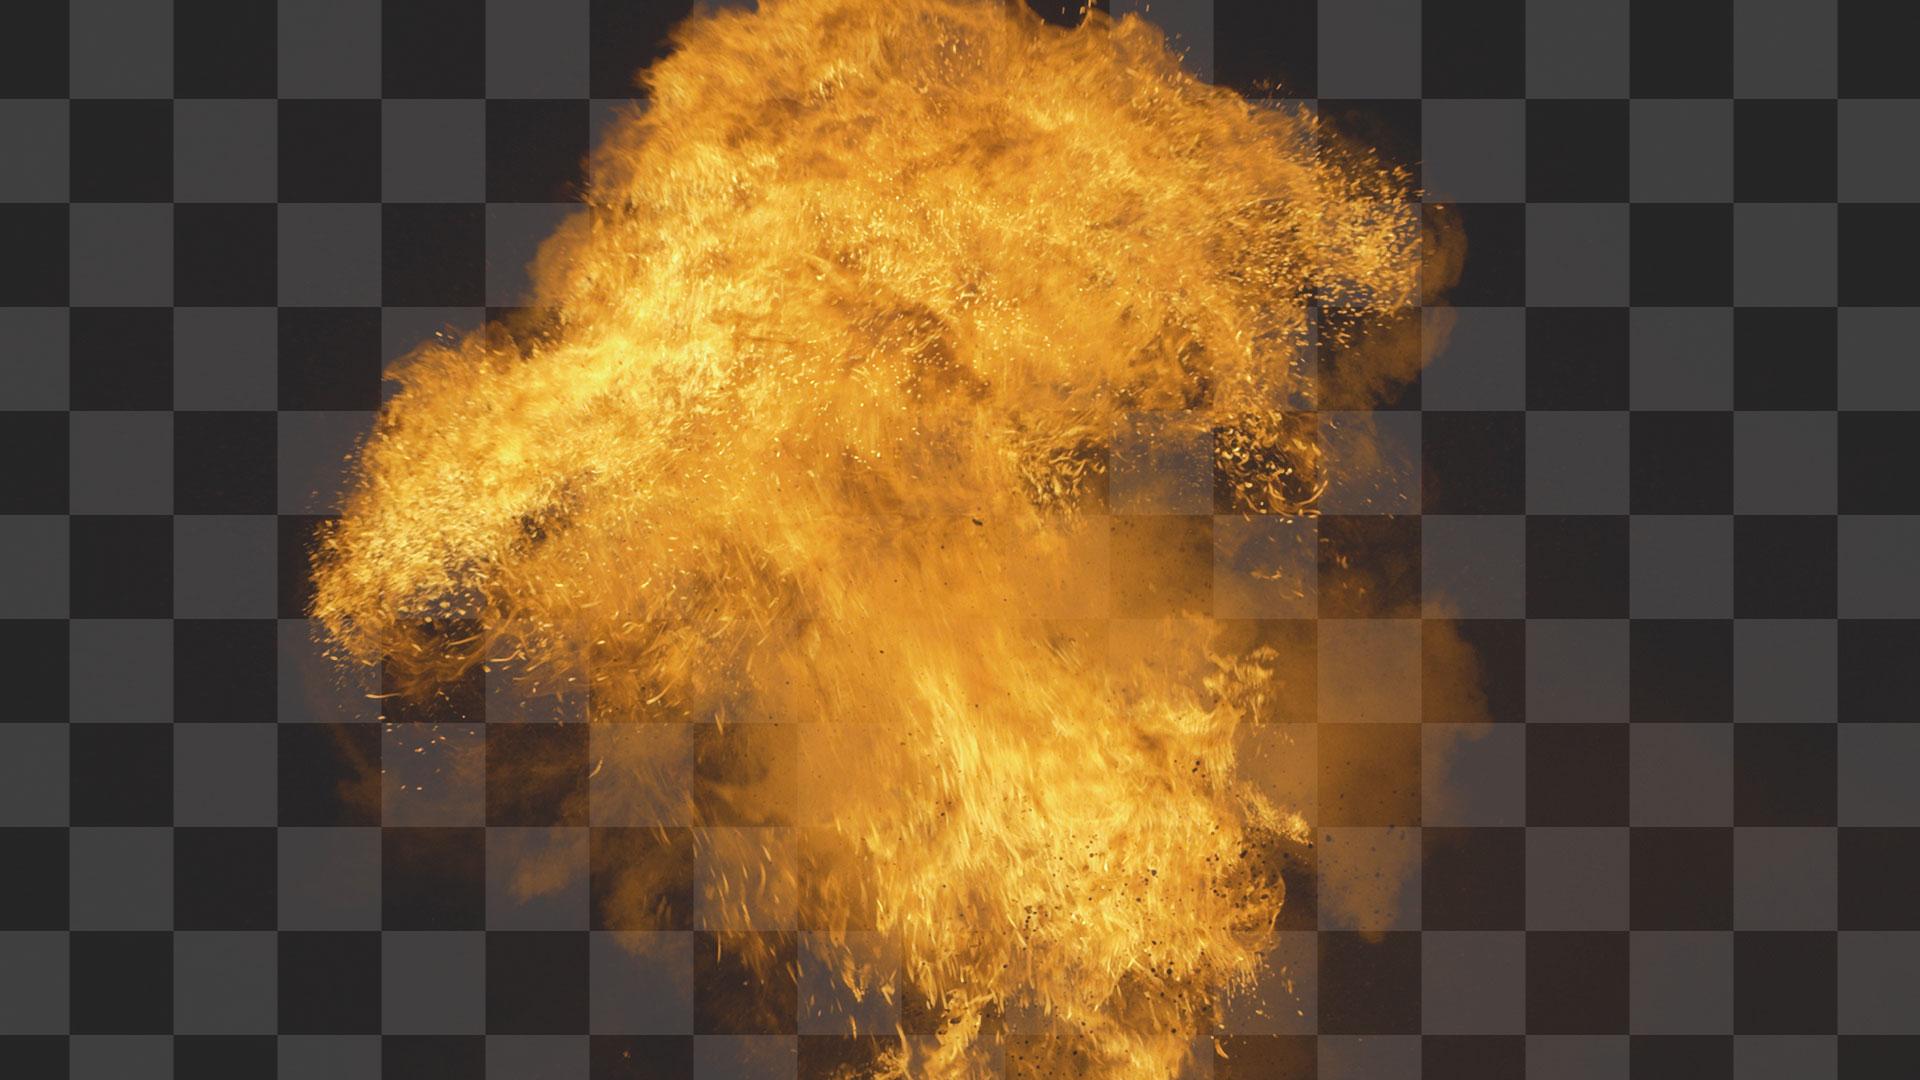 Chroma Key explosion - after (transparent background)